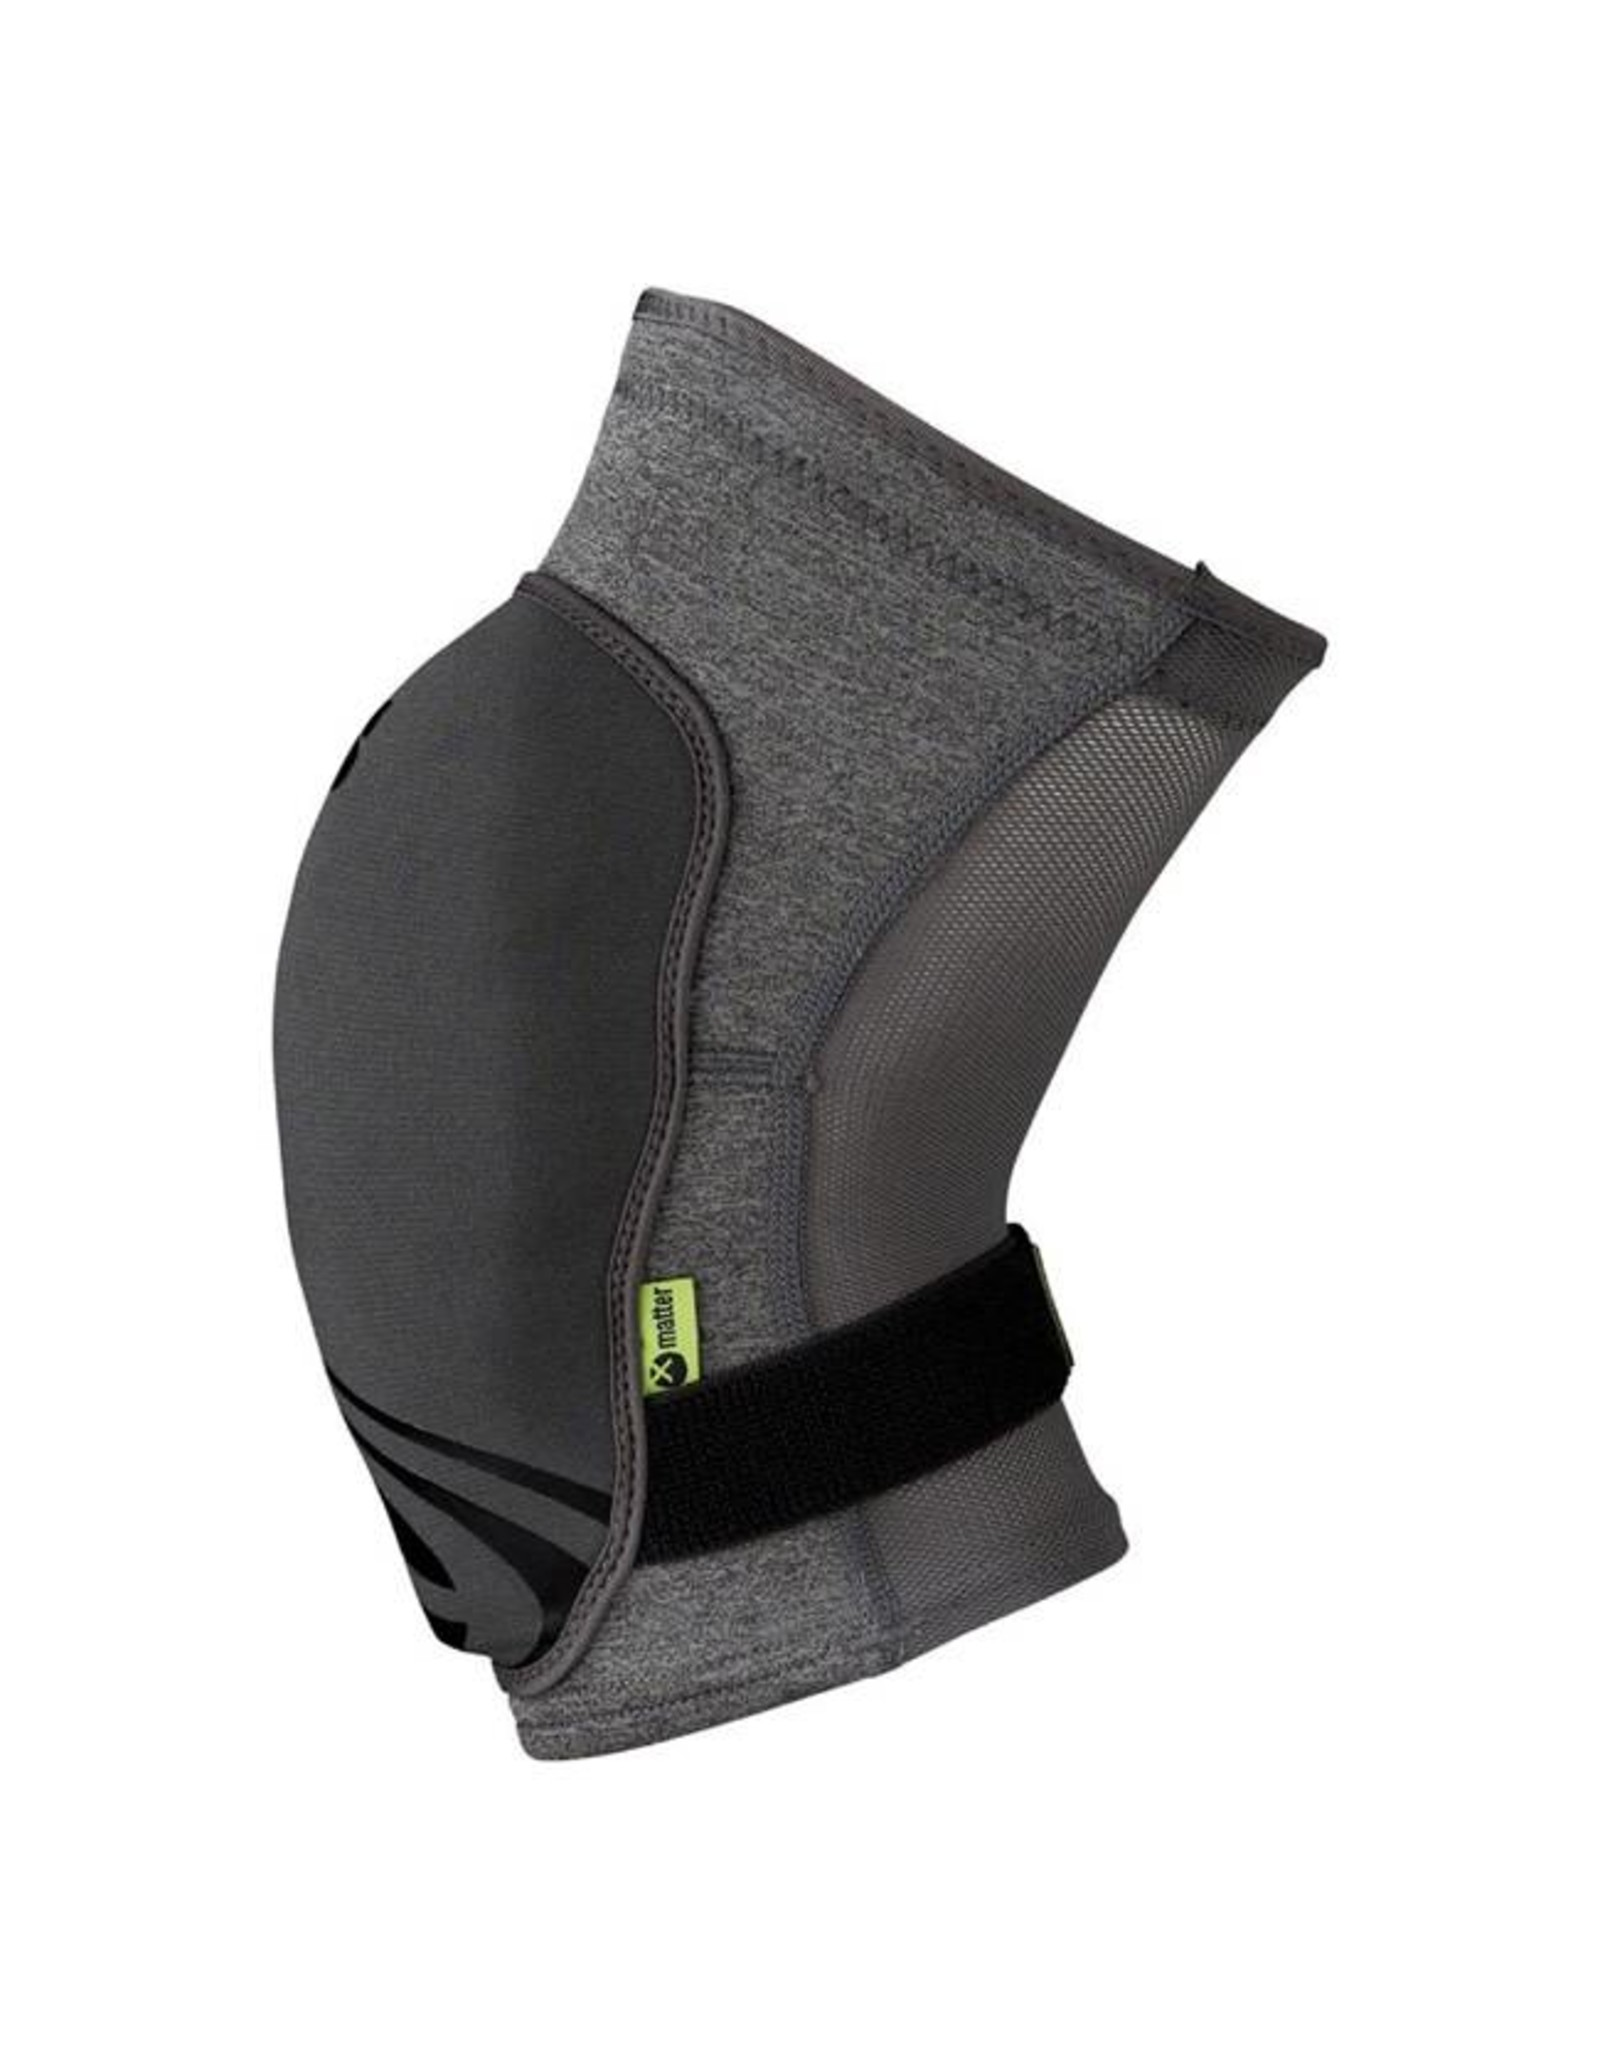 IXS iXS Flow Evo+ Knee Pads: Gray LG